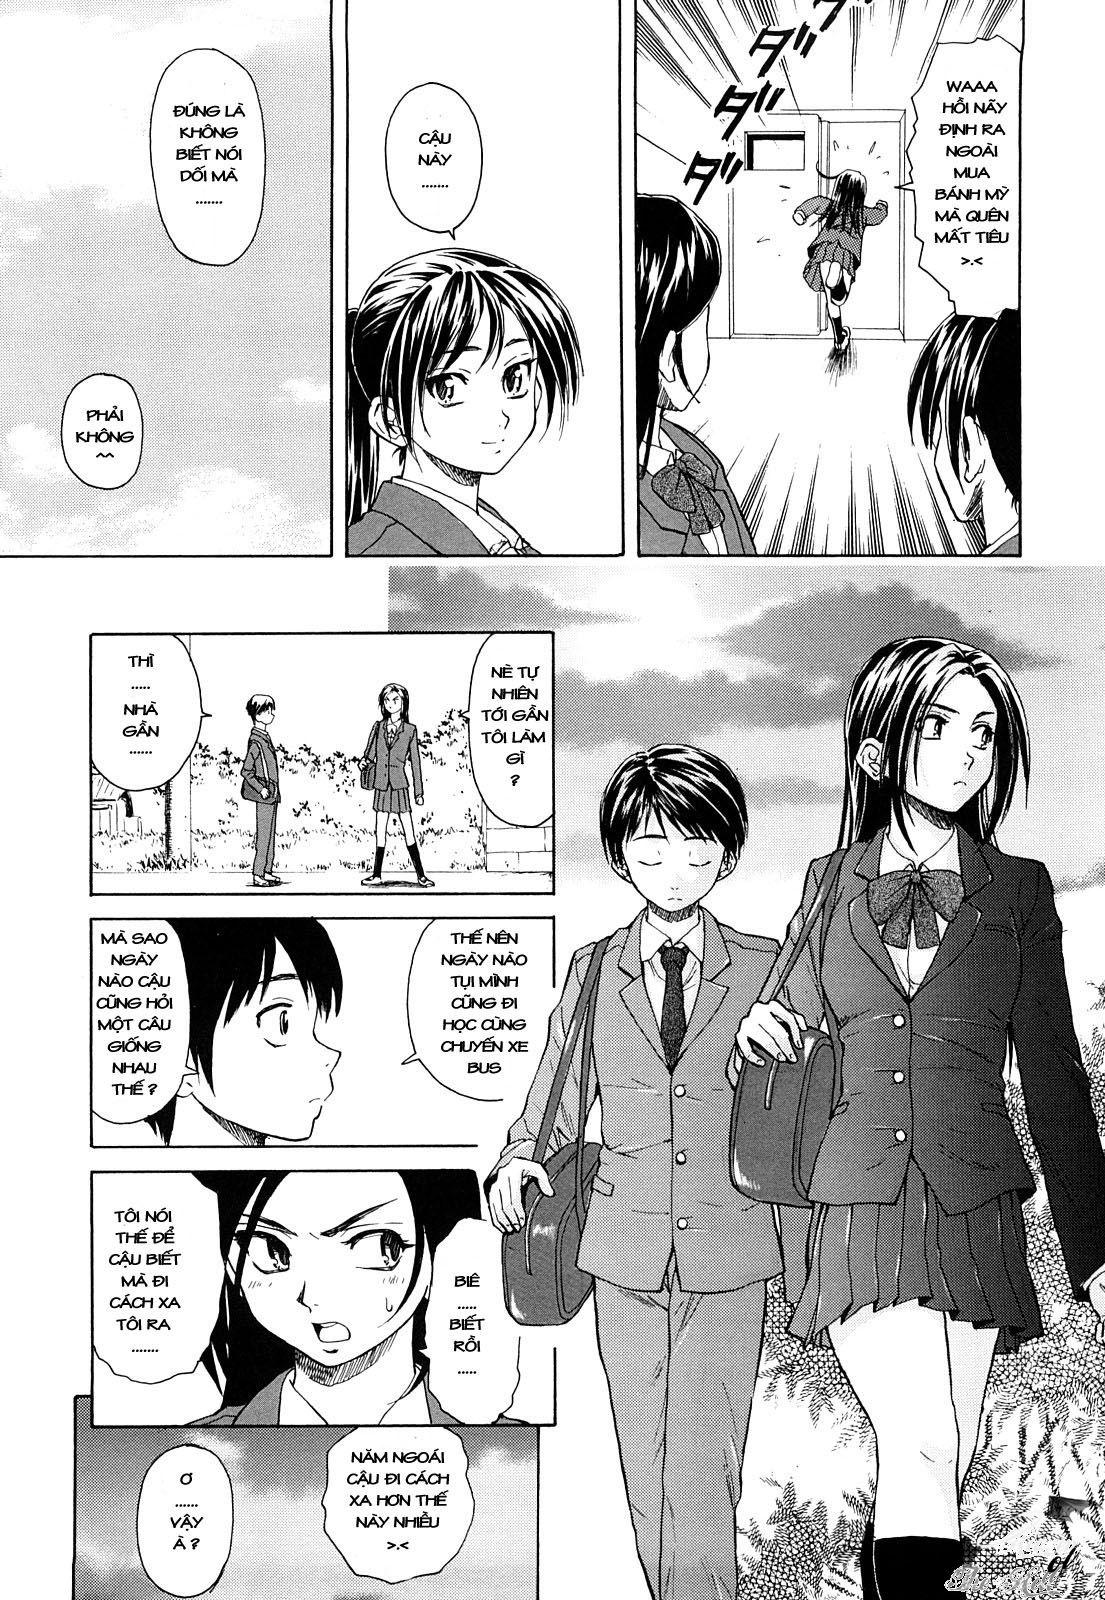 TruyenHay.Com - Ảnh 7 - Setsunai Omoi Chapter 1